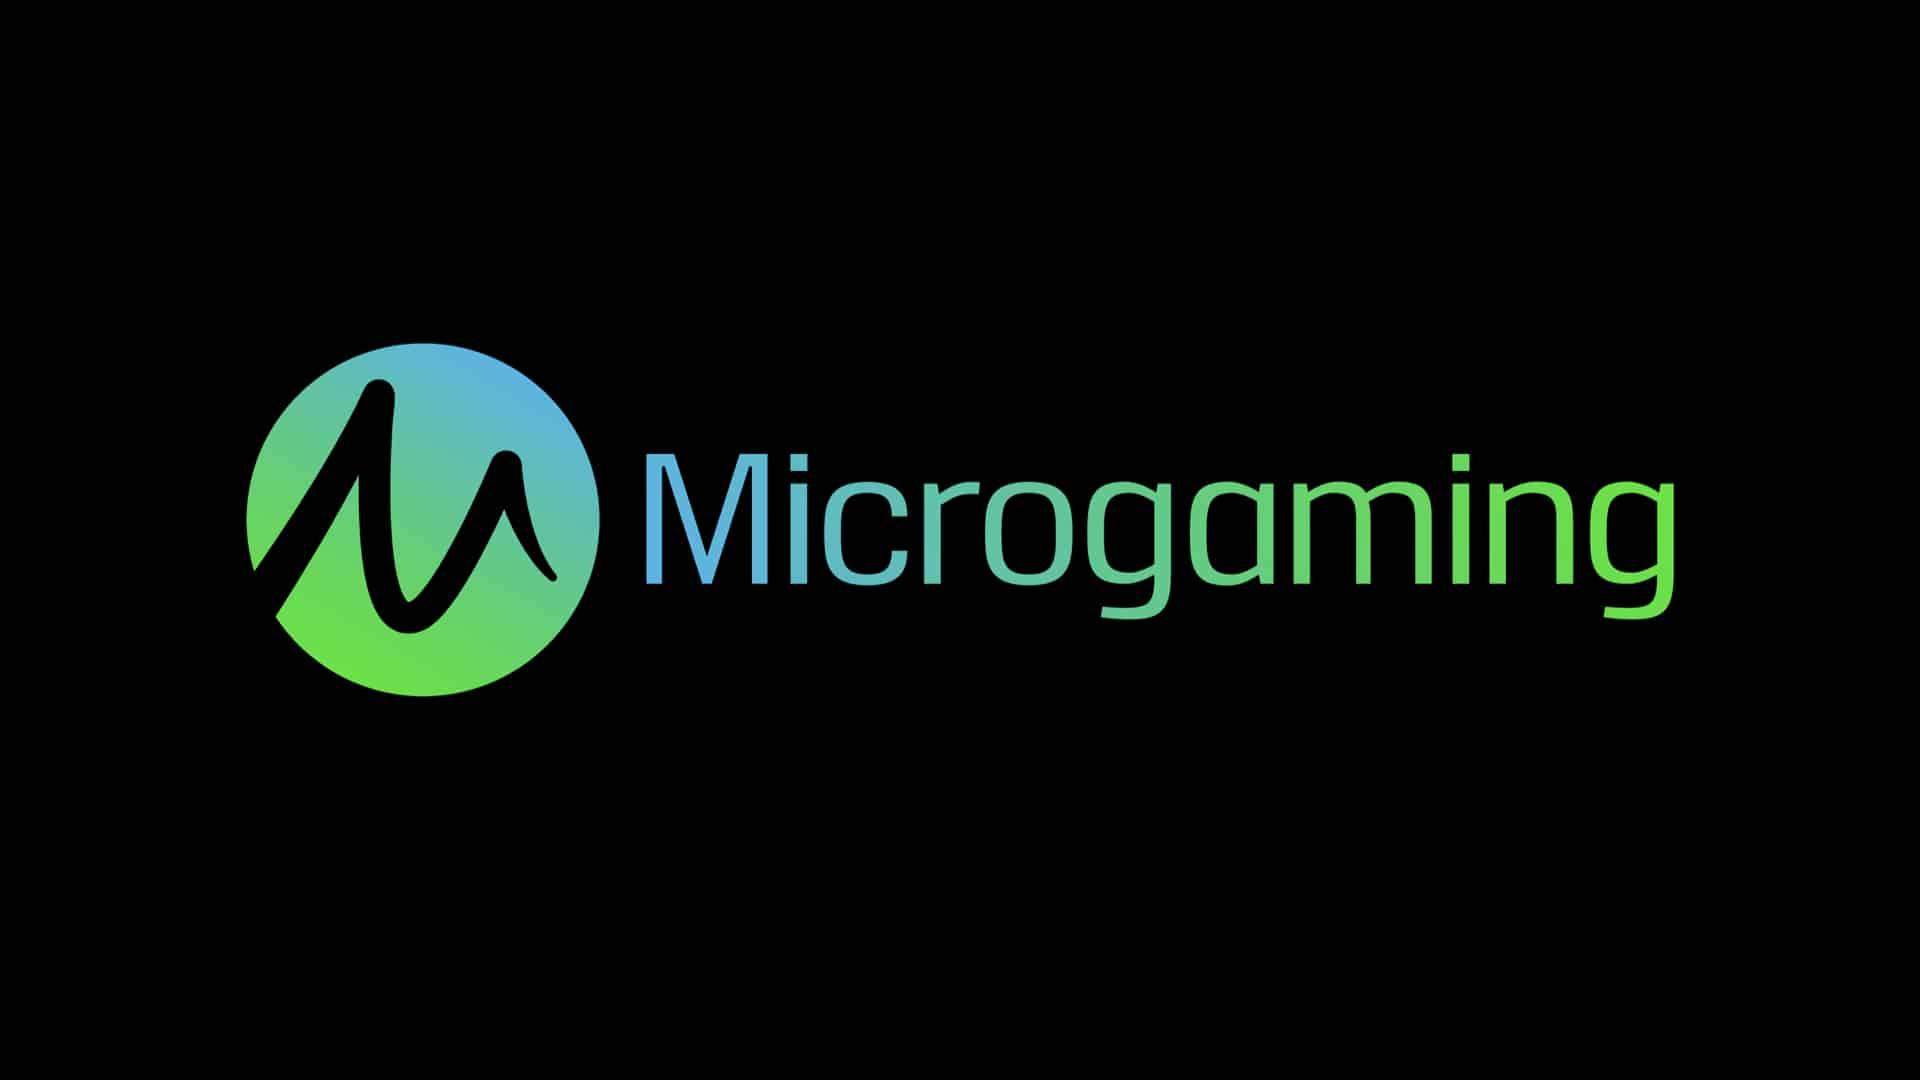 Microgaming Review - CaptainCharity.com